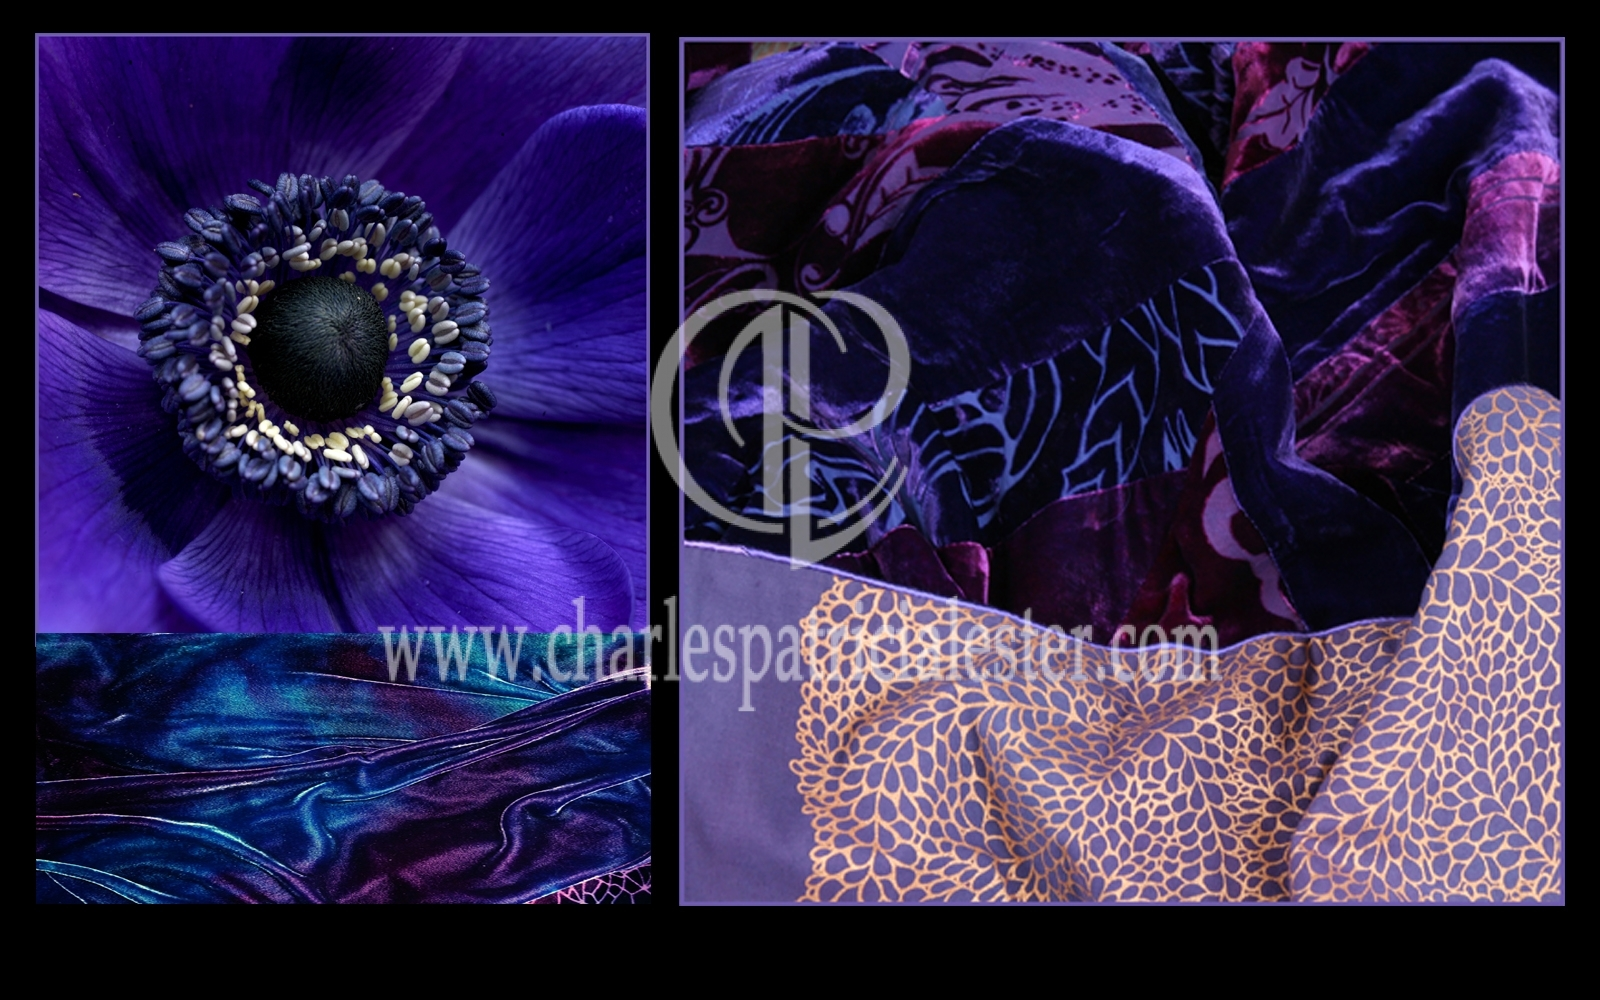 Art textiles for film set design